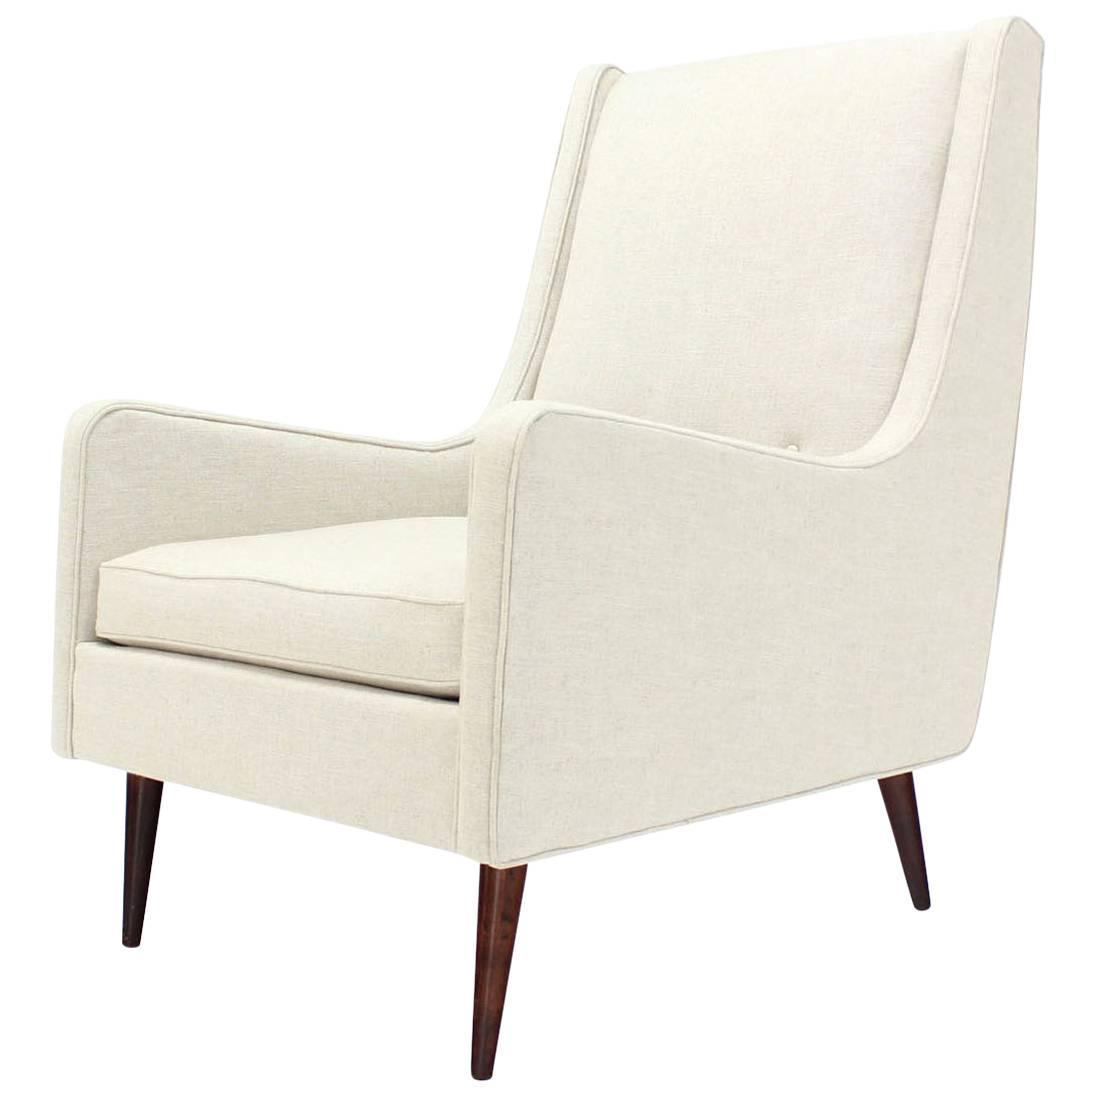 white linen chair indoor hammock swing new upholstery mid century modern lounge